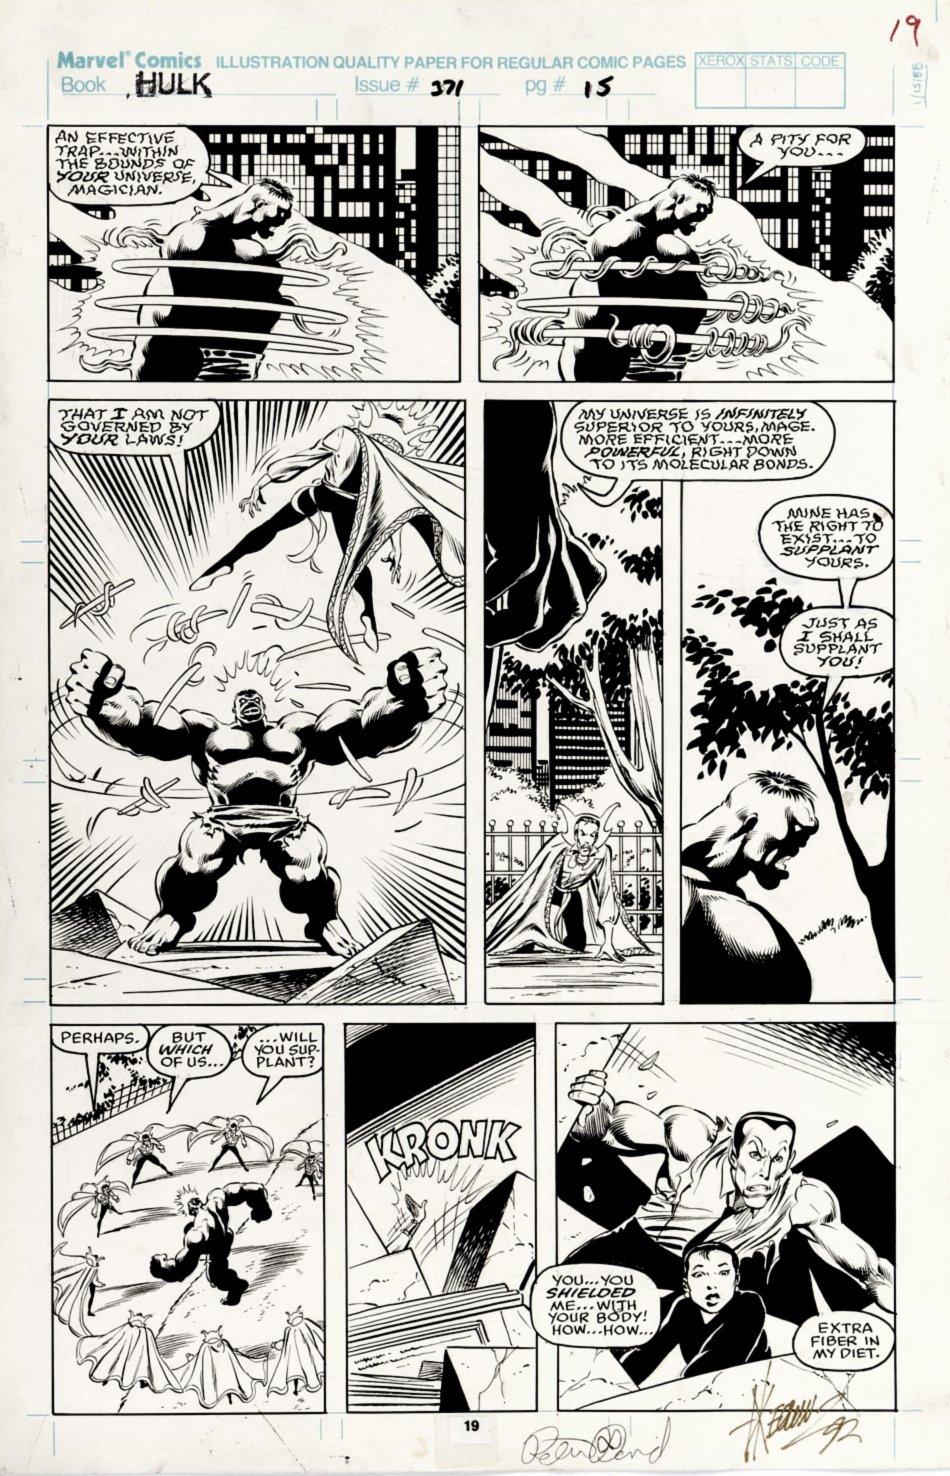 Incredible Hulk #371 p 19 (Hulk In 5 Panels Battling Dr. Strange & Sub-Mariner!) 1990